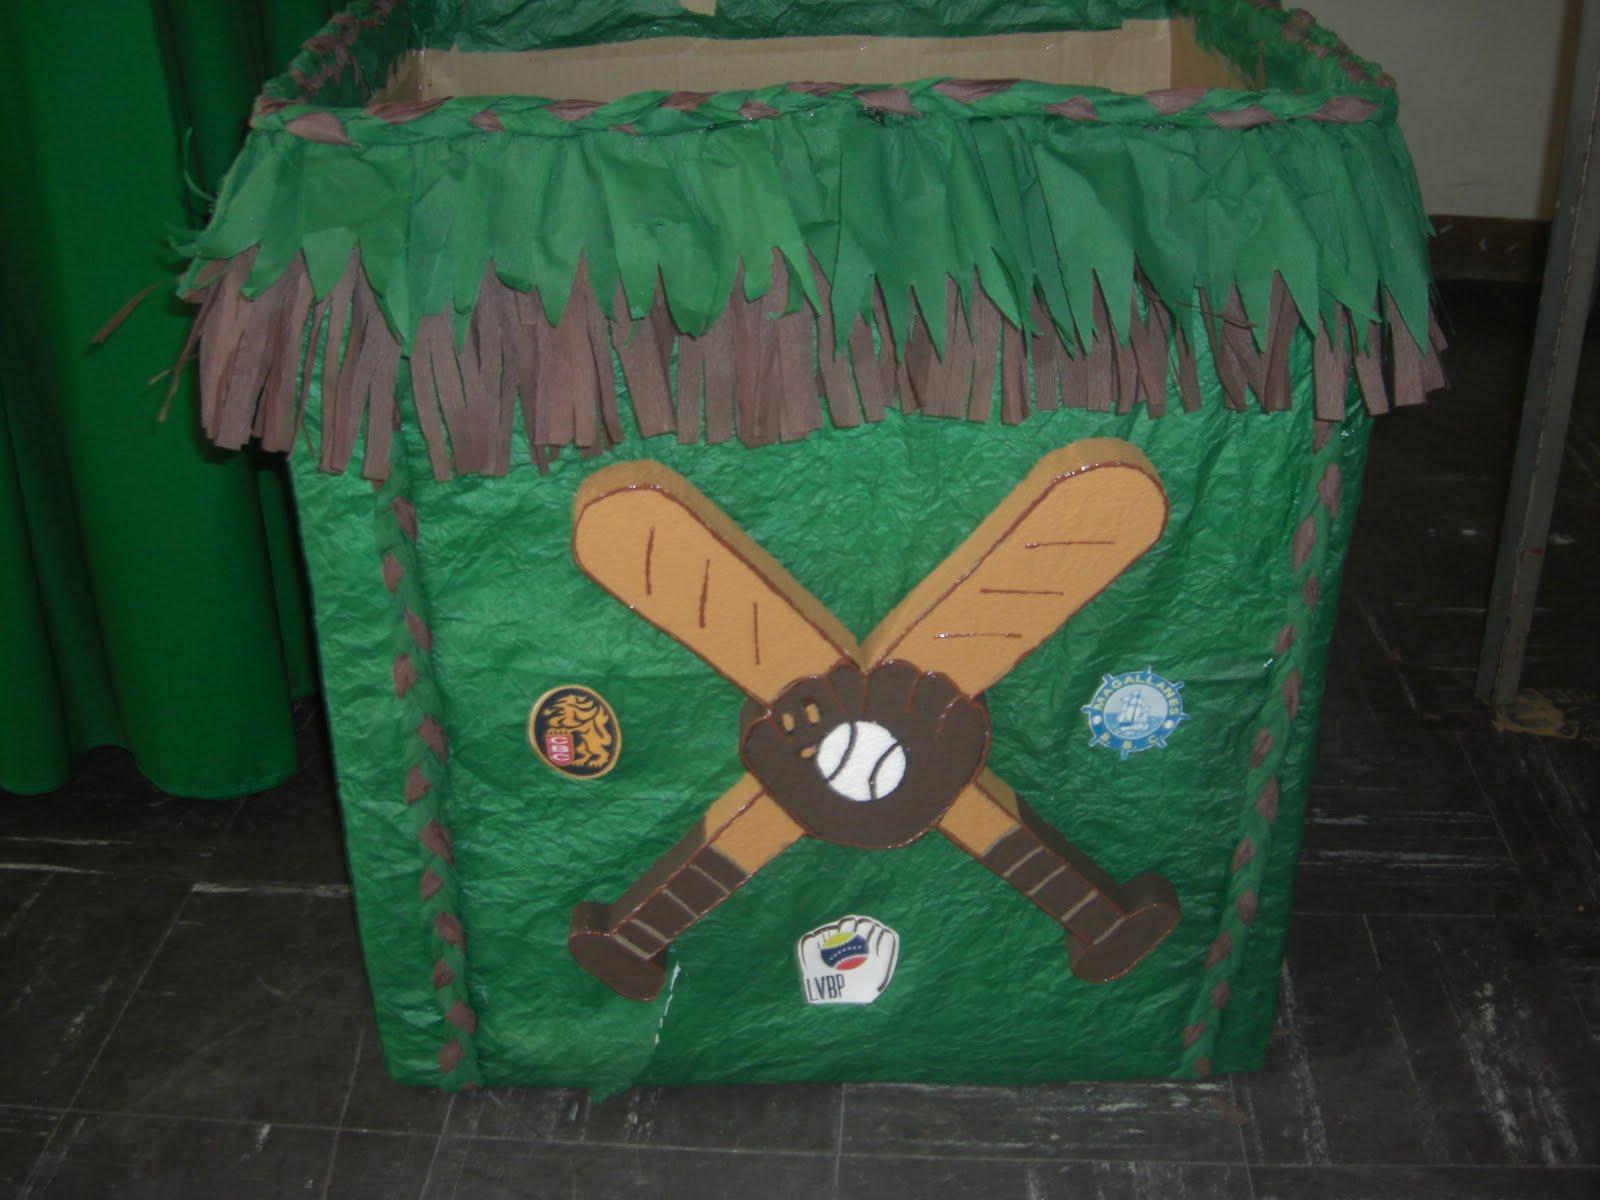 ideas para decoracion de fiestas infantiles | facilisimo.com